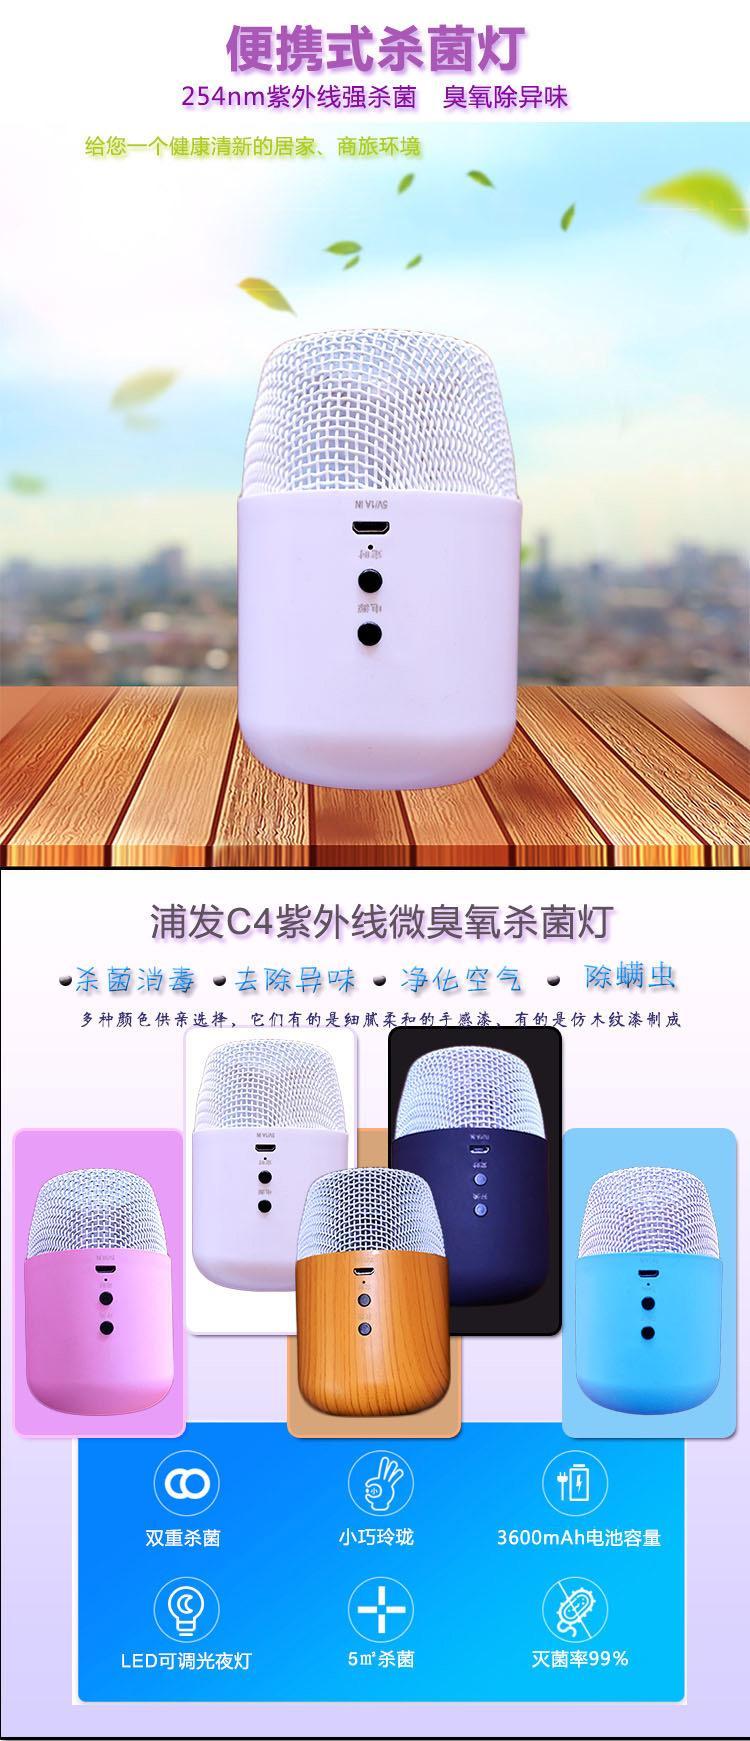 Ozone UV sterilization lamp for home kitchen refrigerator wardrobe bathroom 1